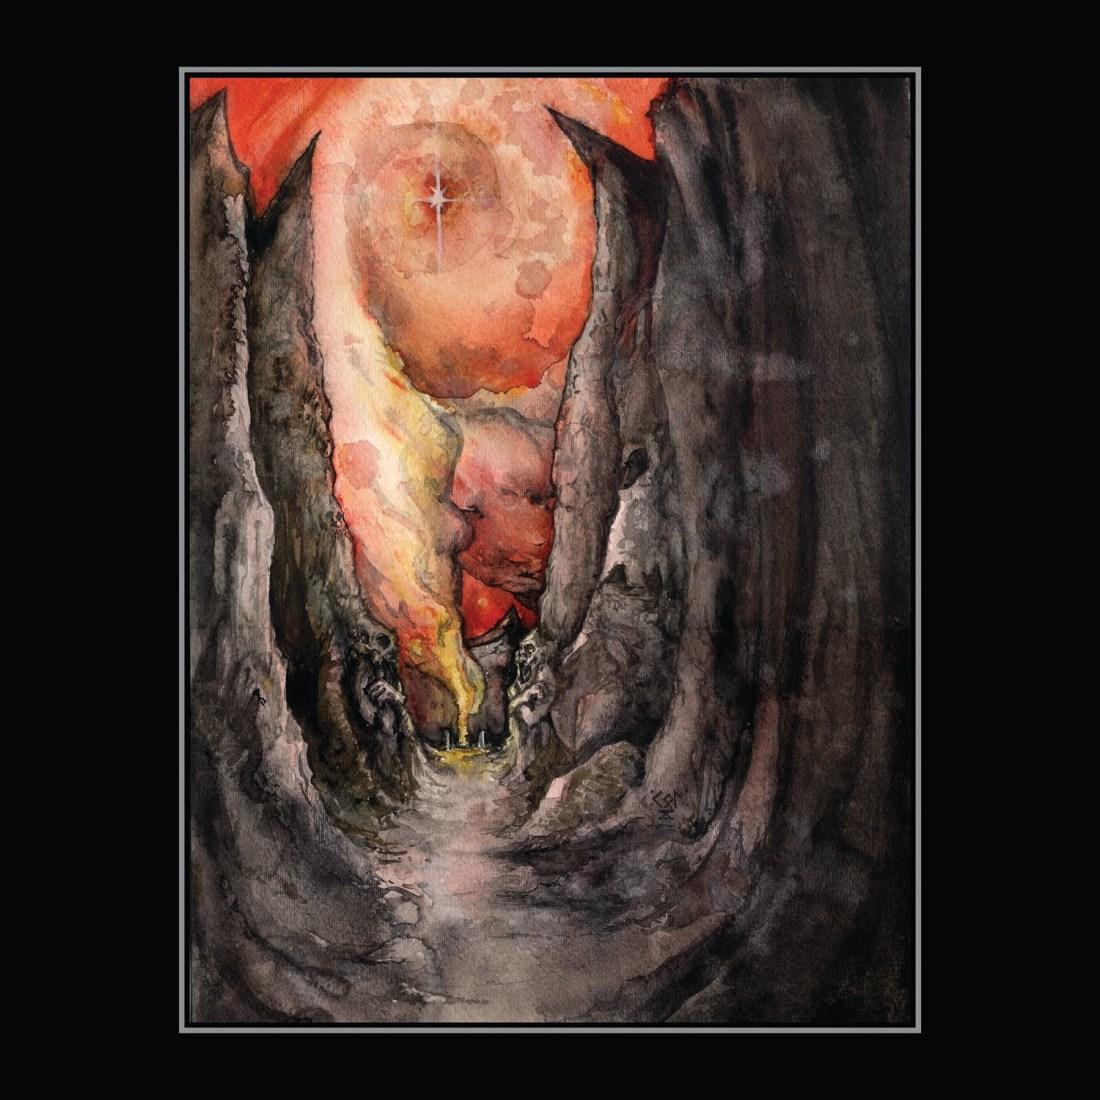 Aldebaran – Embracing The Lightless Depths Review – Last Rites